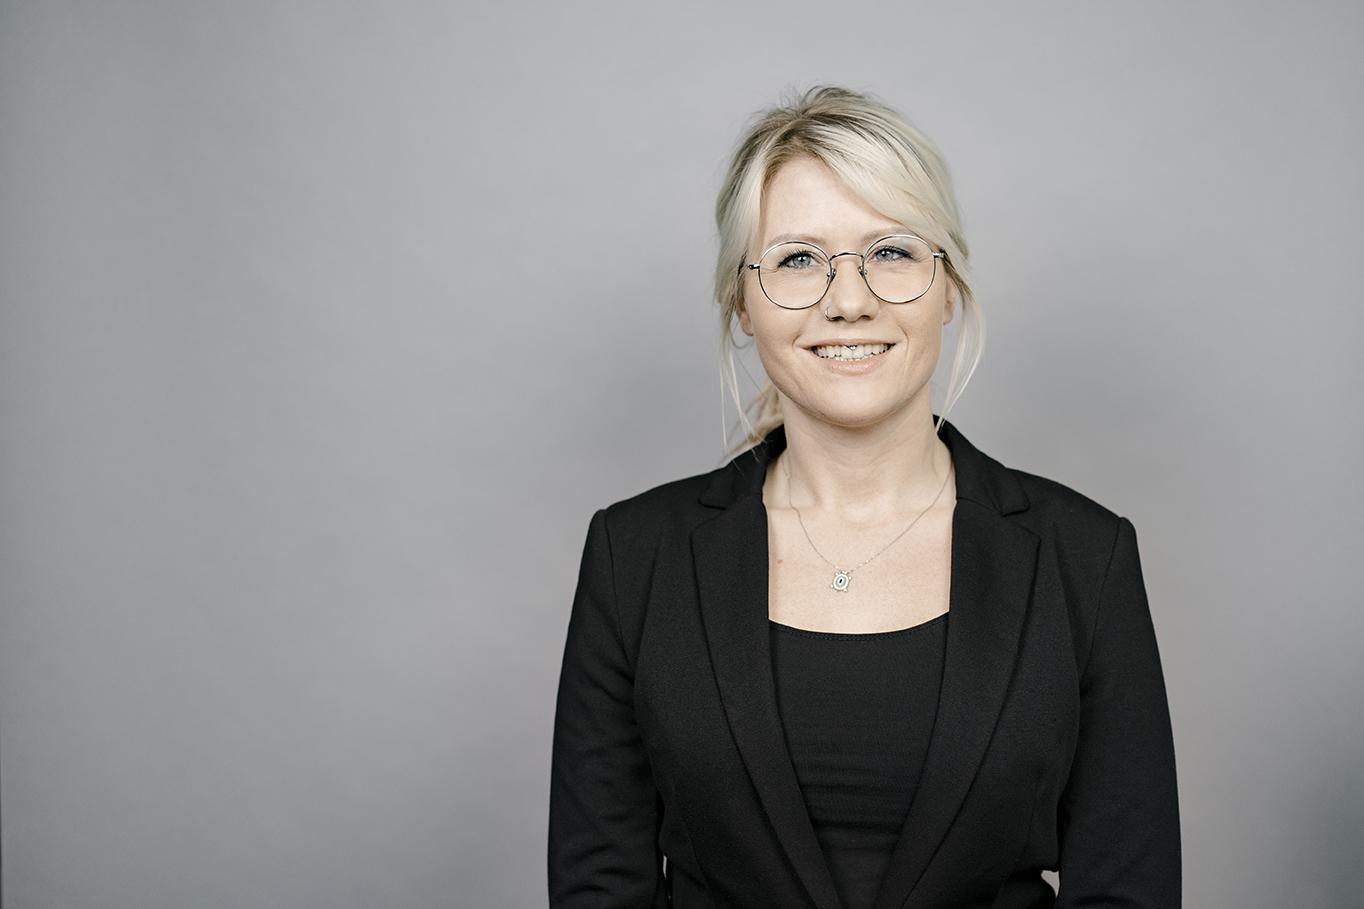 Janina Görs